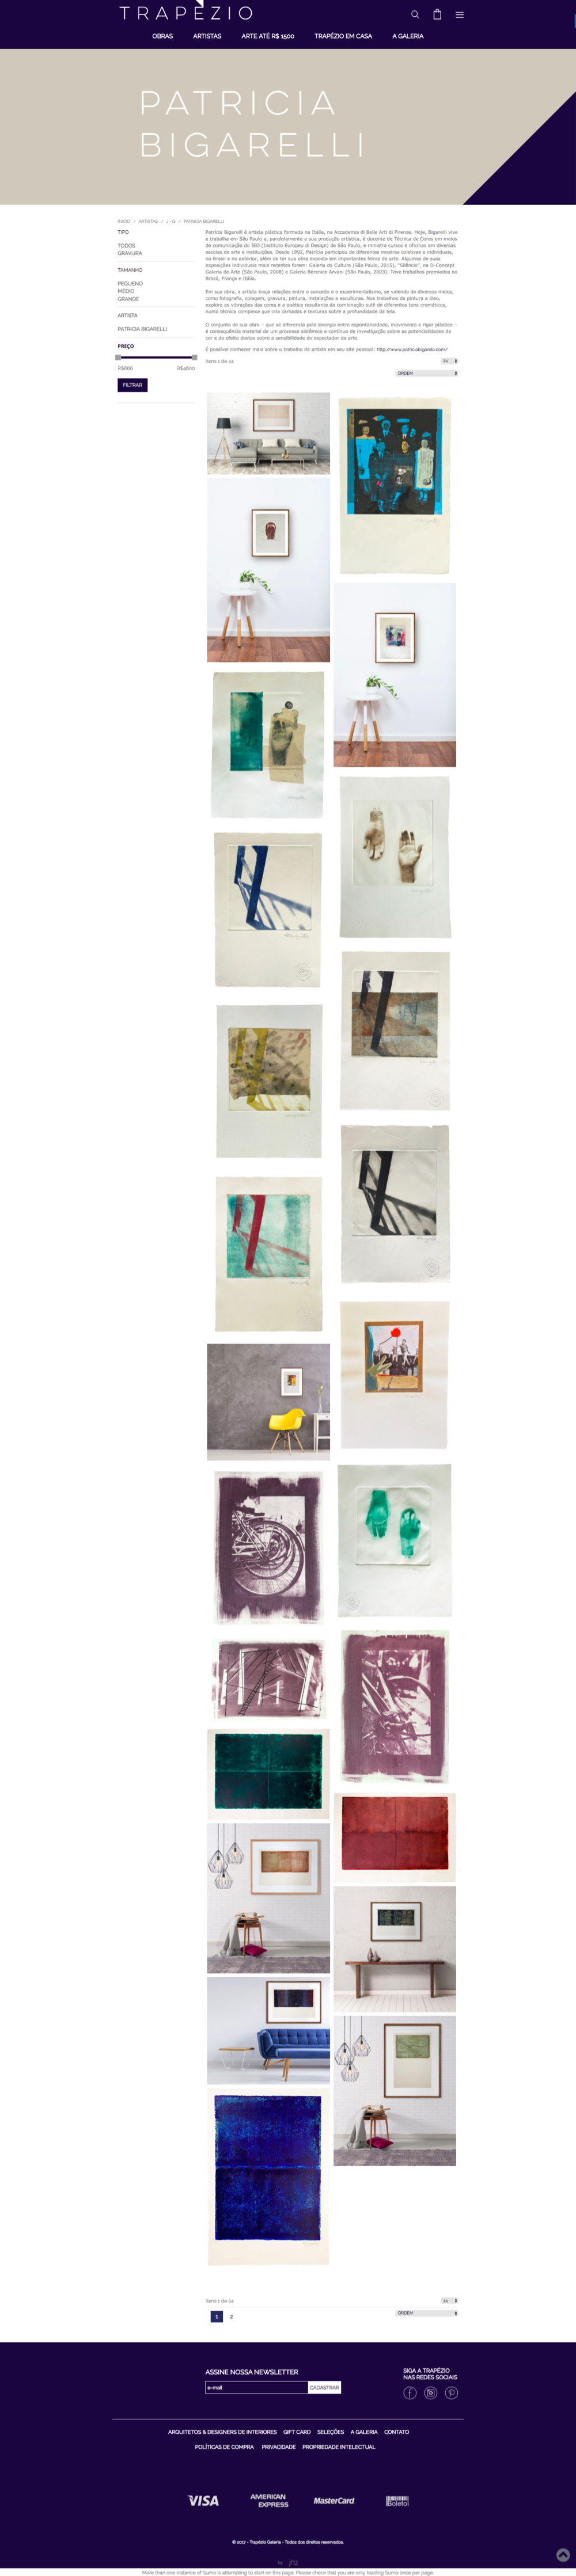 trapeziogaleria-artistas-j-q-patricia-bigarelli-2018-09-05-12_58_34.png